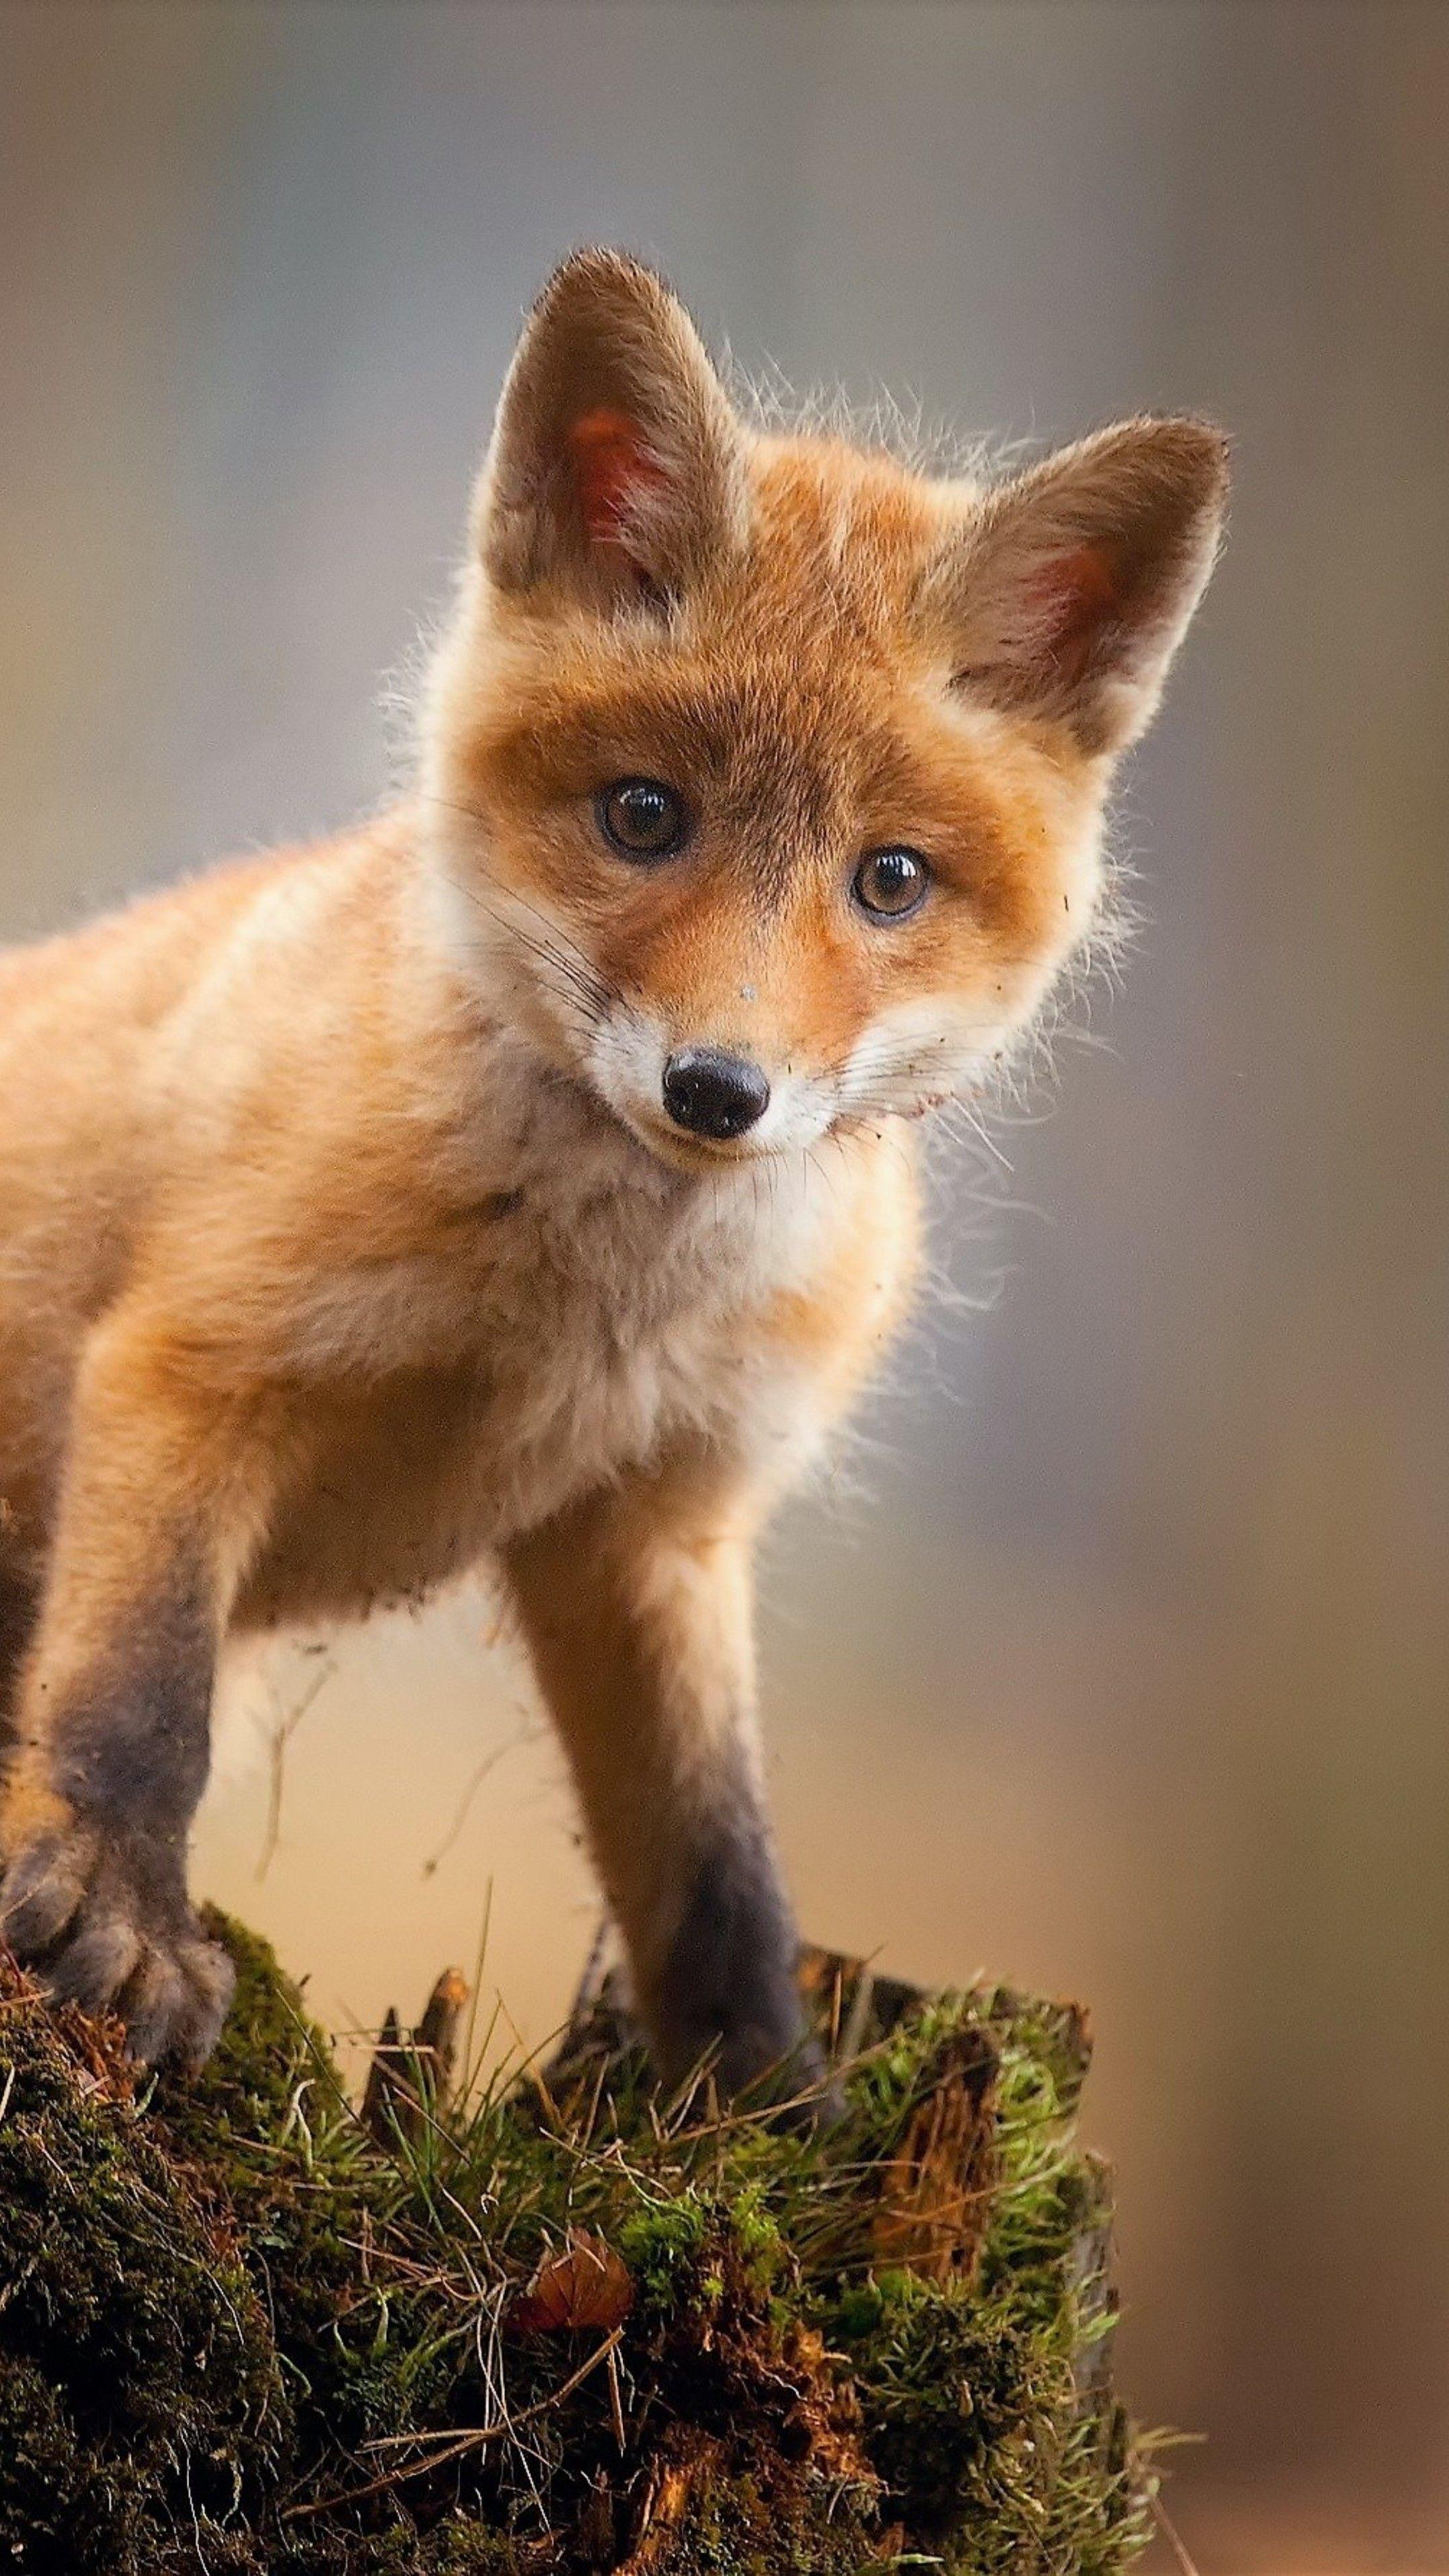 Animals Fox Cub Baby Animal Cute Hd wallpapers hd 4k